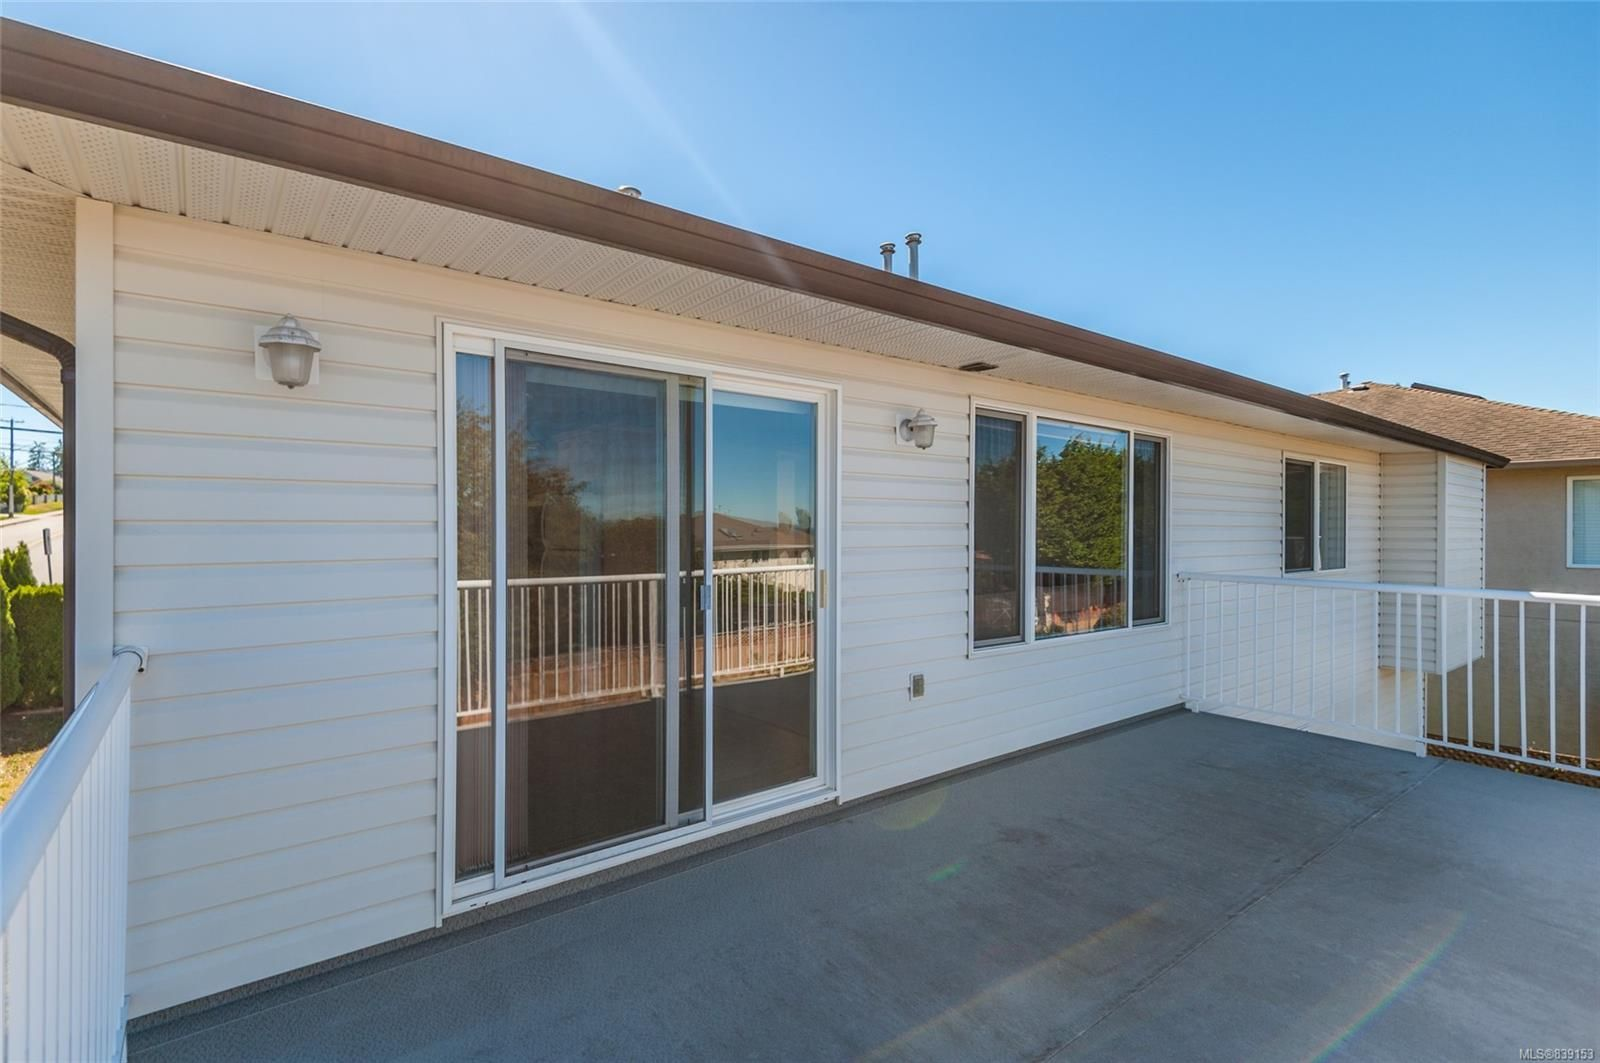 Photo 15: Photos: 6412 Dover Rd in NANAIMO: Na North Nanaimo House for sale (Nanaimo)  : MLS®# 839153